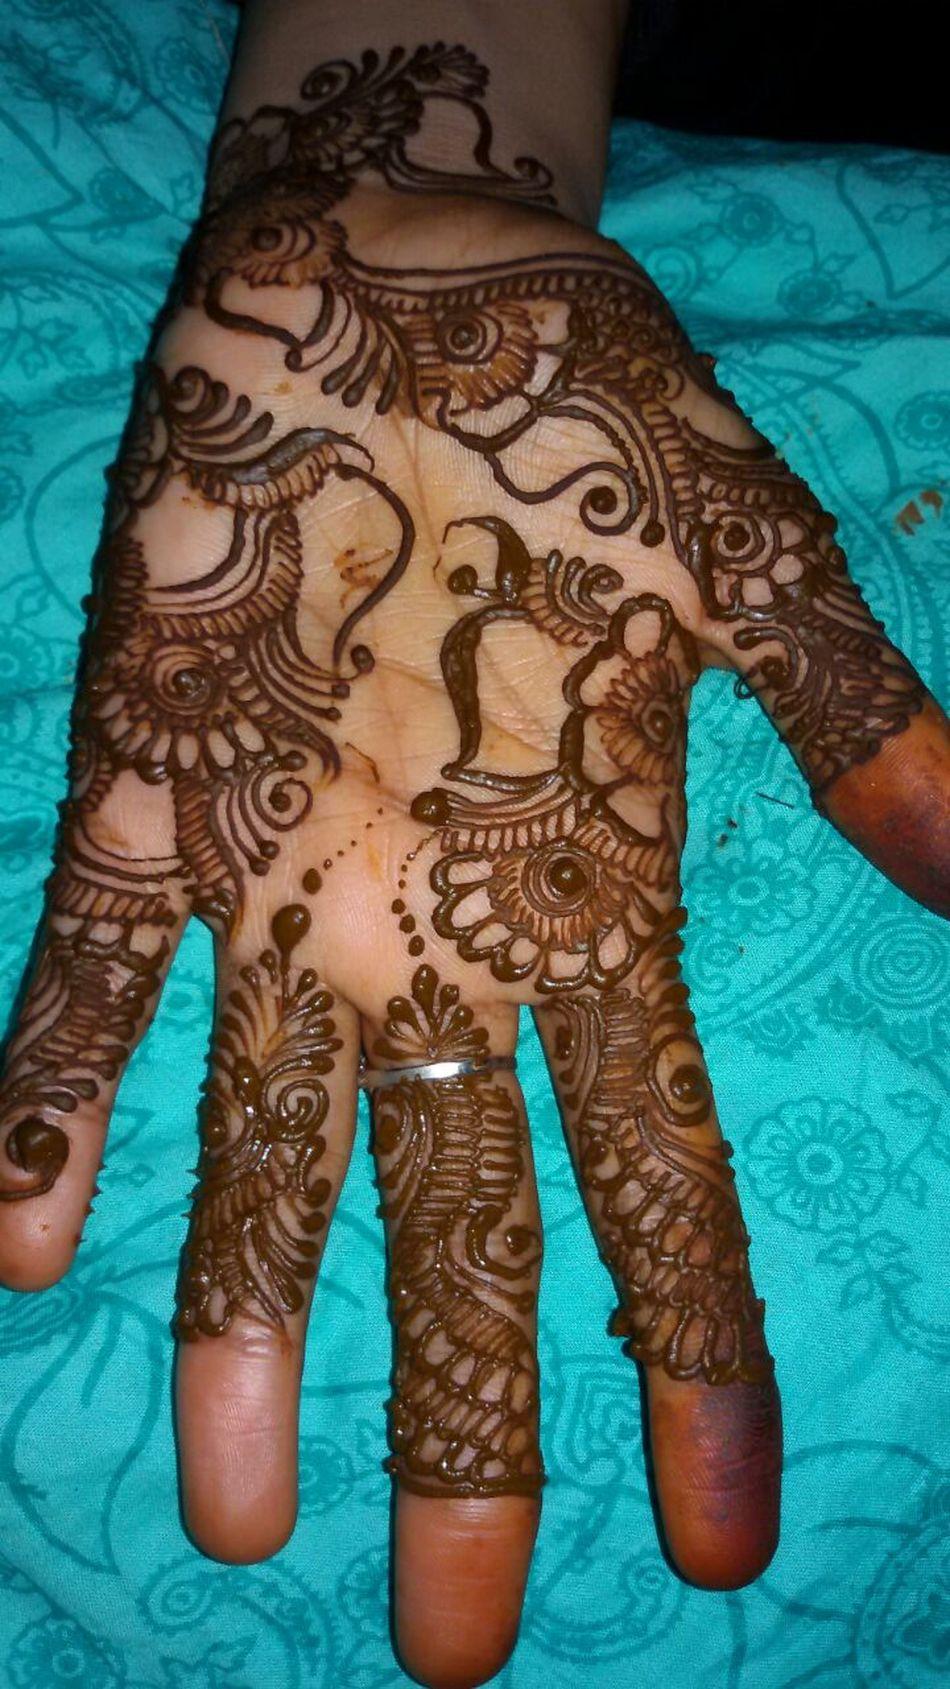 Henna Tattoo Henna Tattoo ❤ Design Close-up Human Body Part Human Hand Art And Craft Creativity Art High Angle View Parasngupta_photography